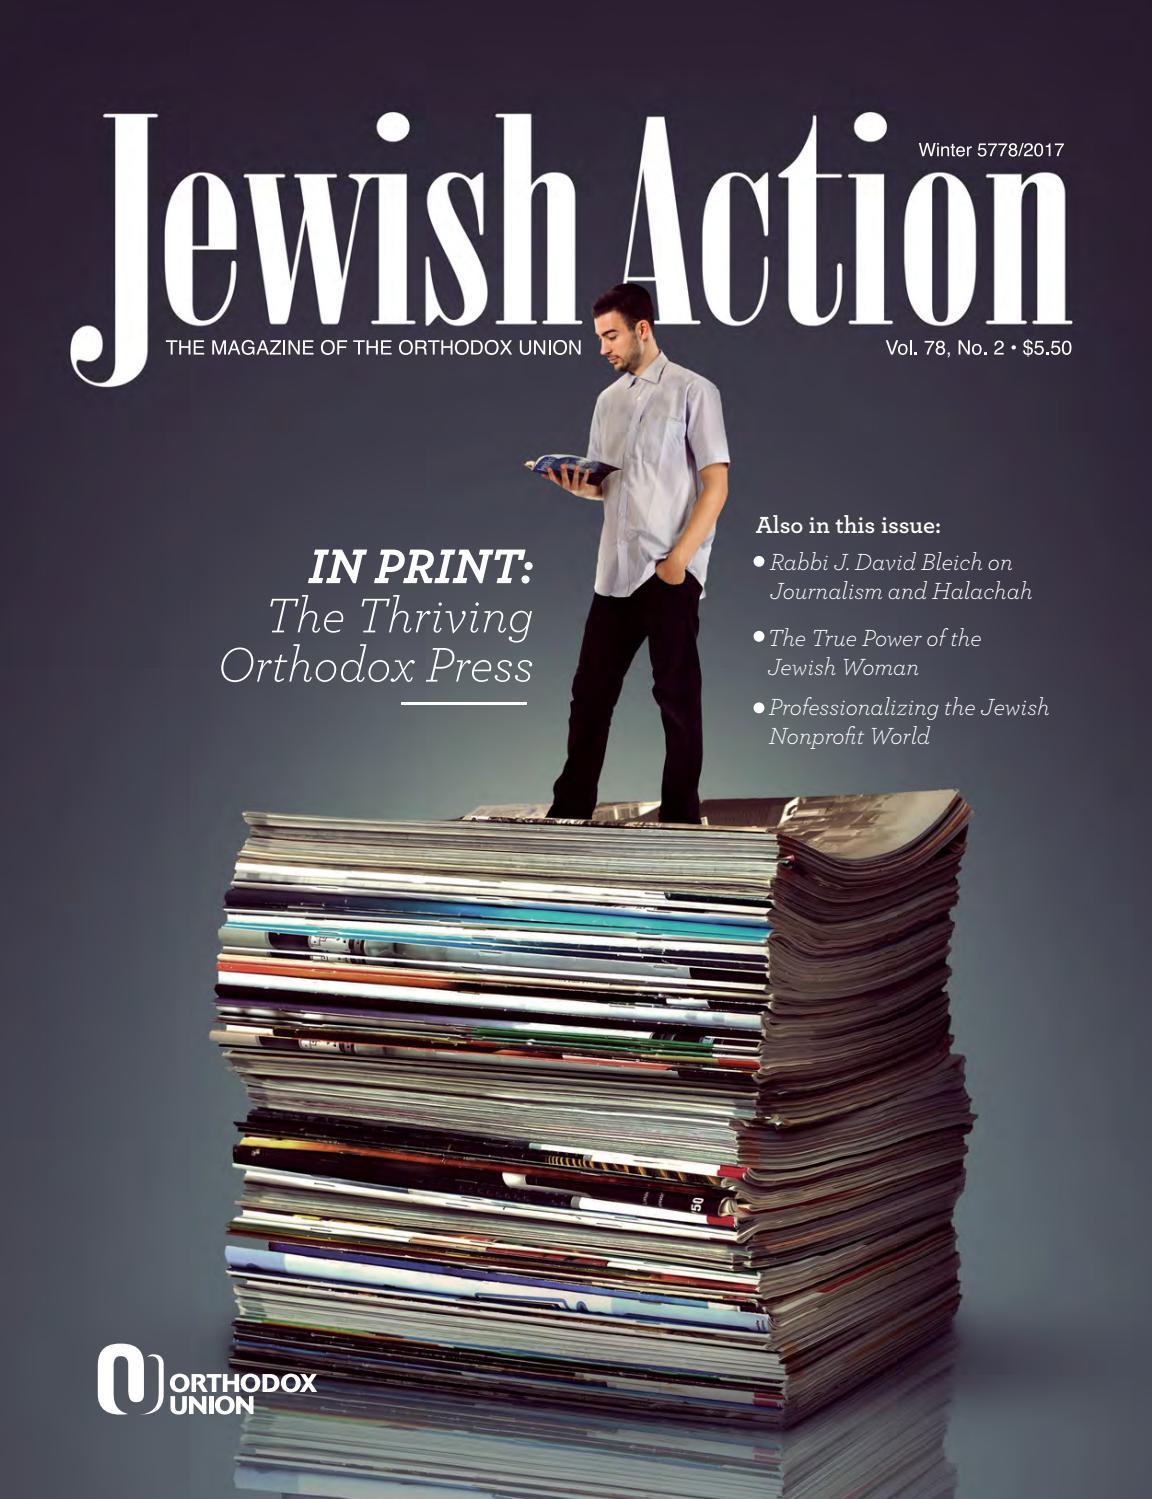 Jewish action winter 2017 by orthodox union issuu fandeluxe Choice Image